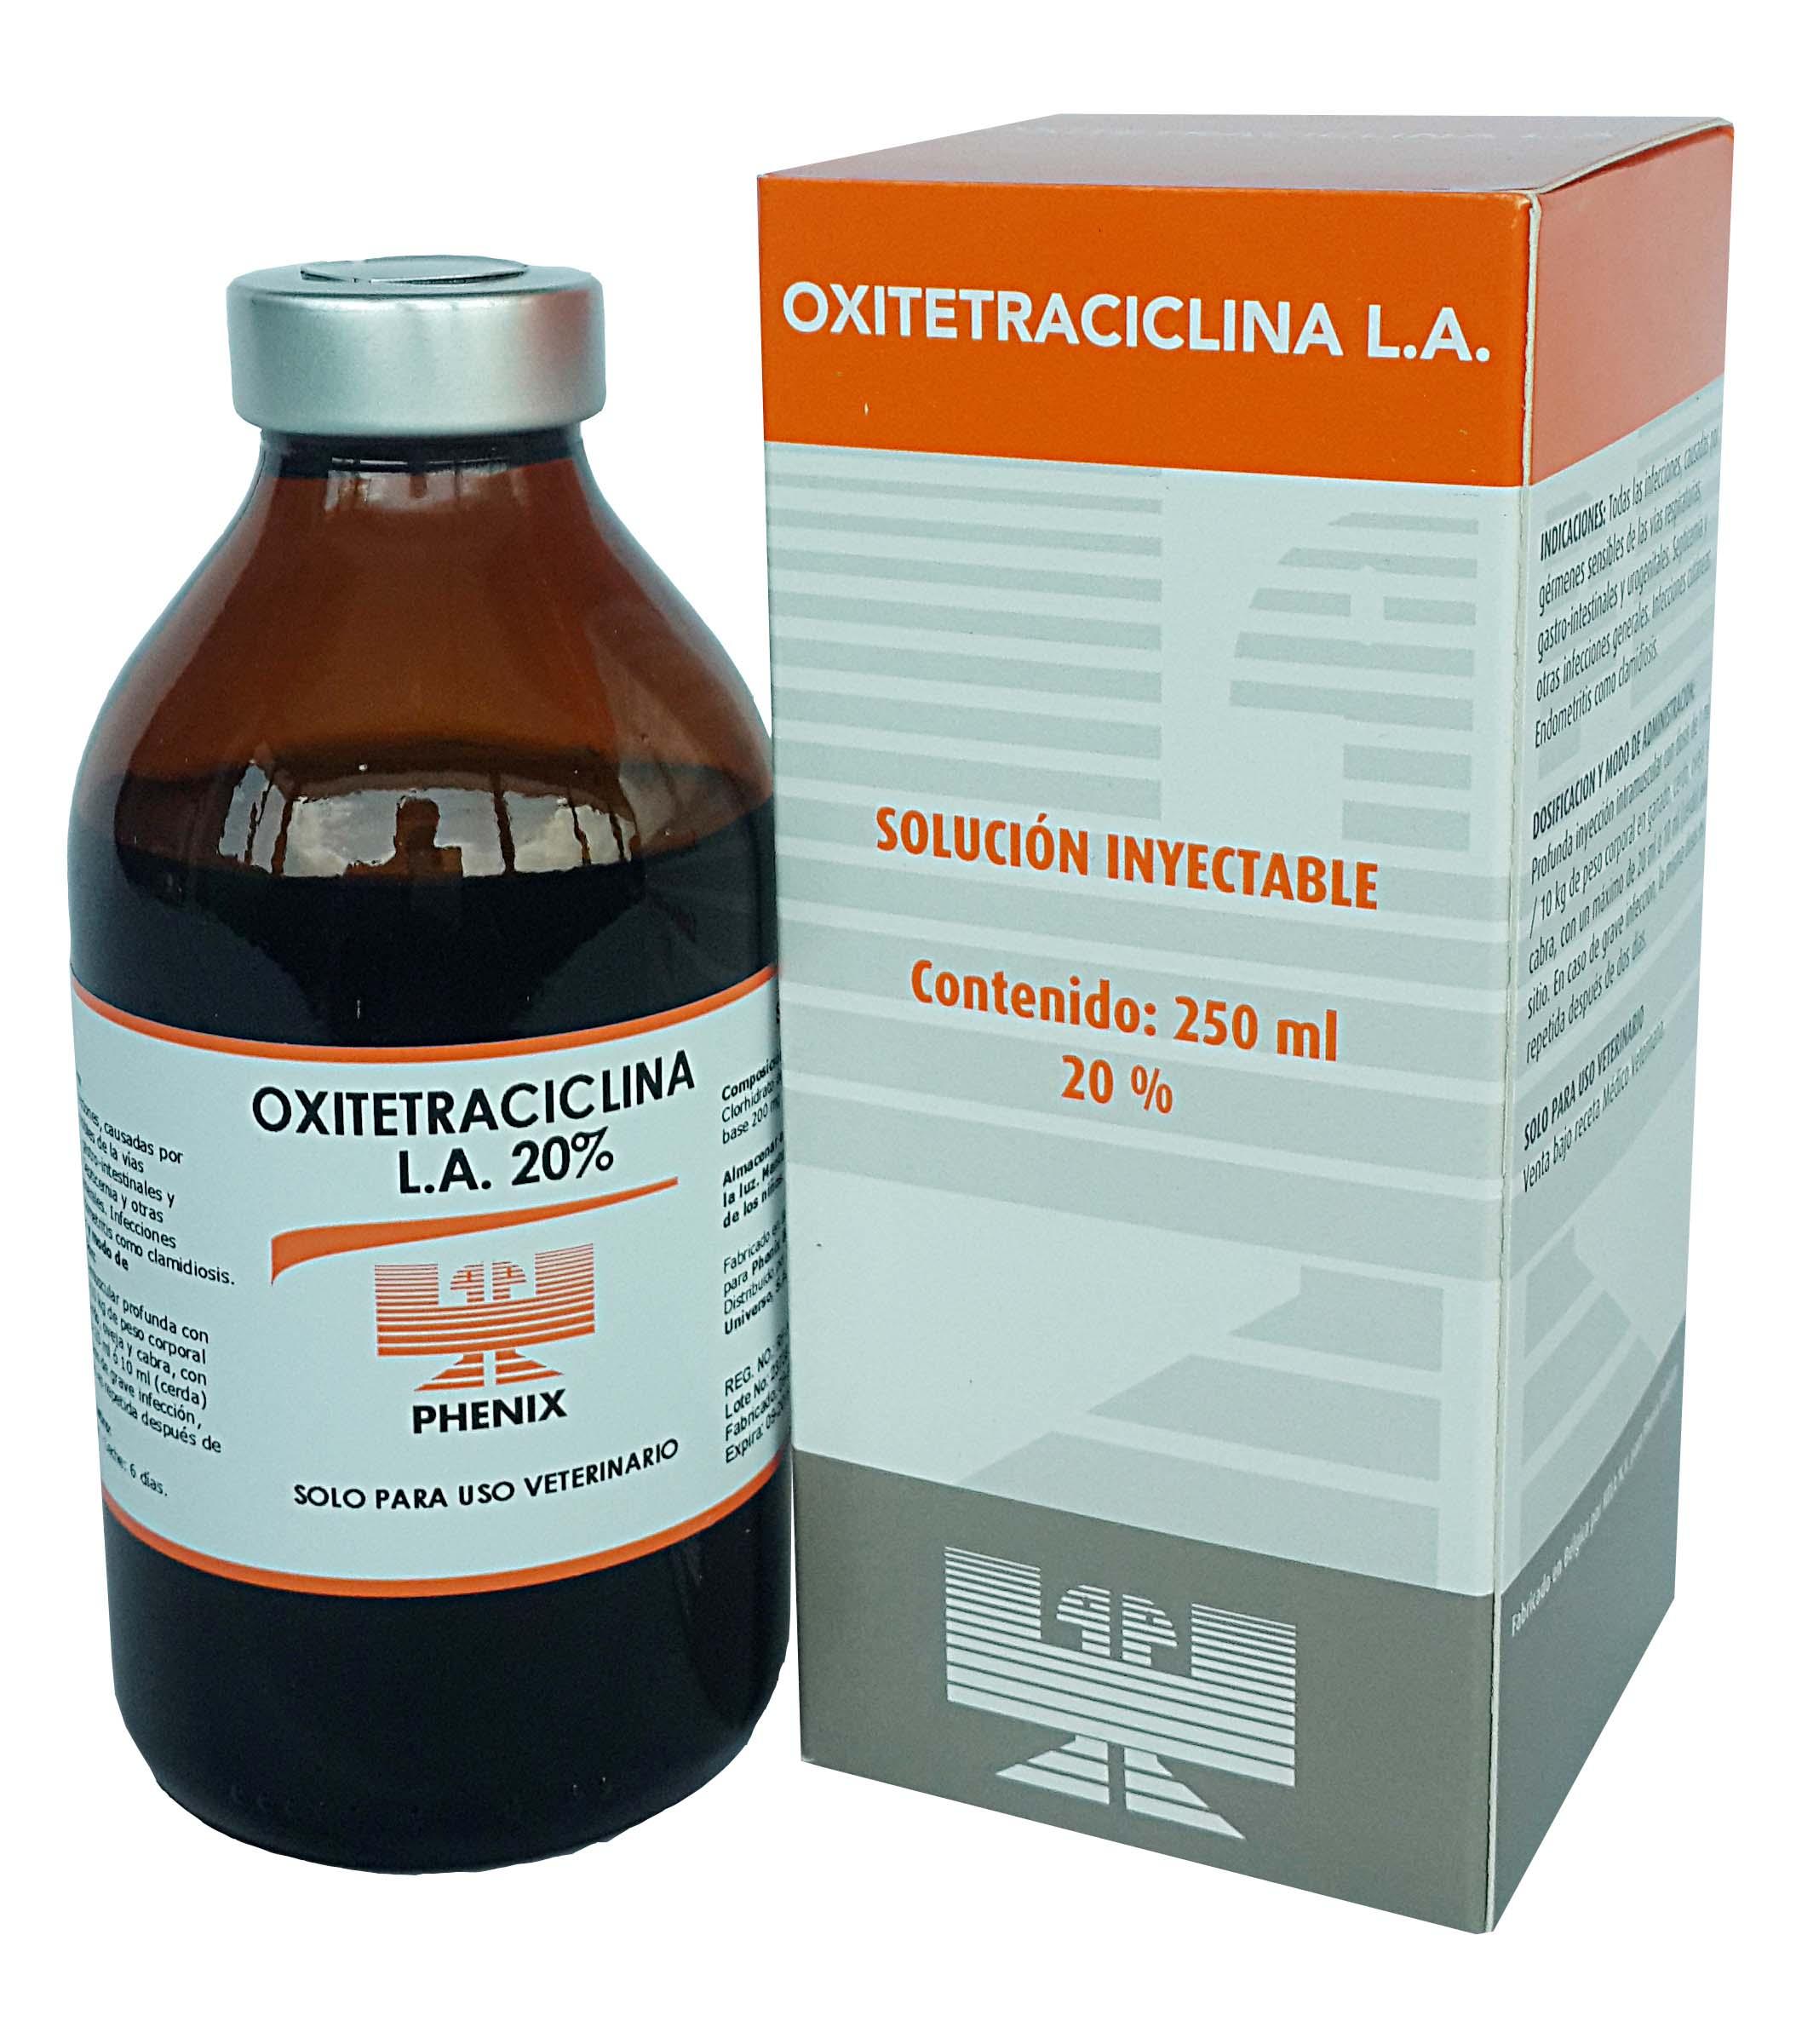 Oxitetraciclina L.A